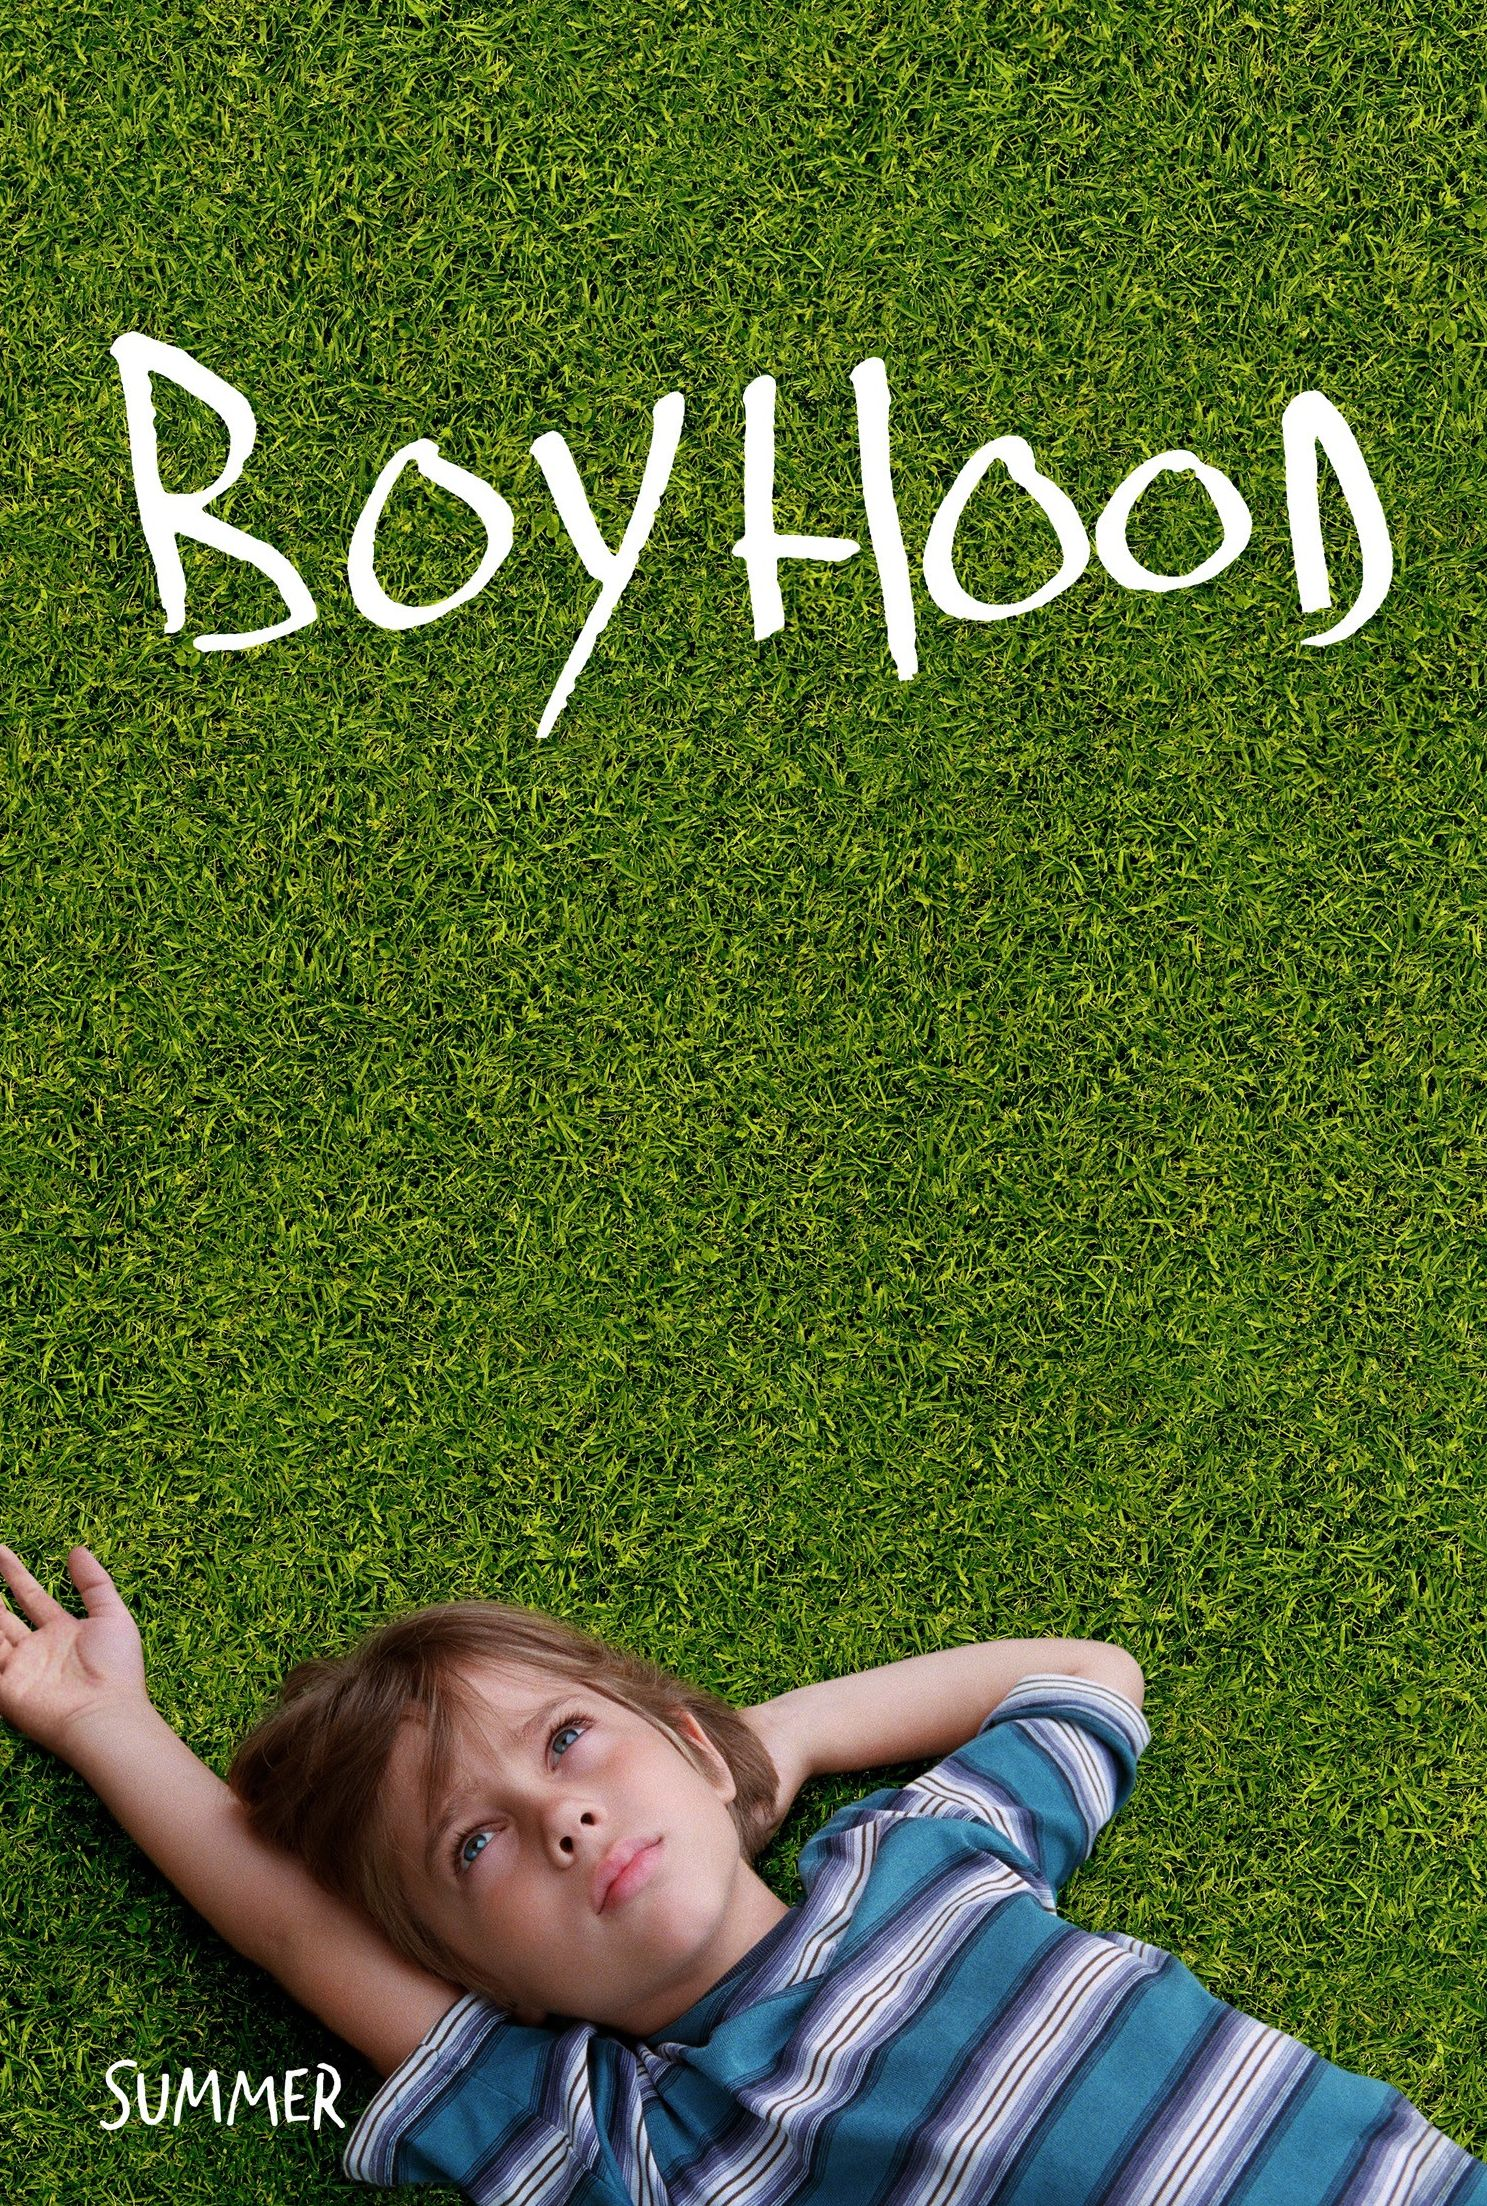 Boyhood Official Poster, release July 11